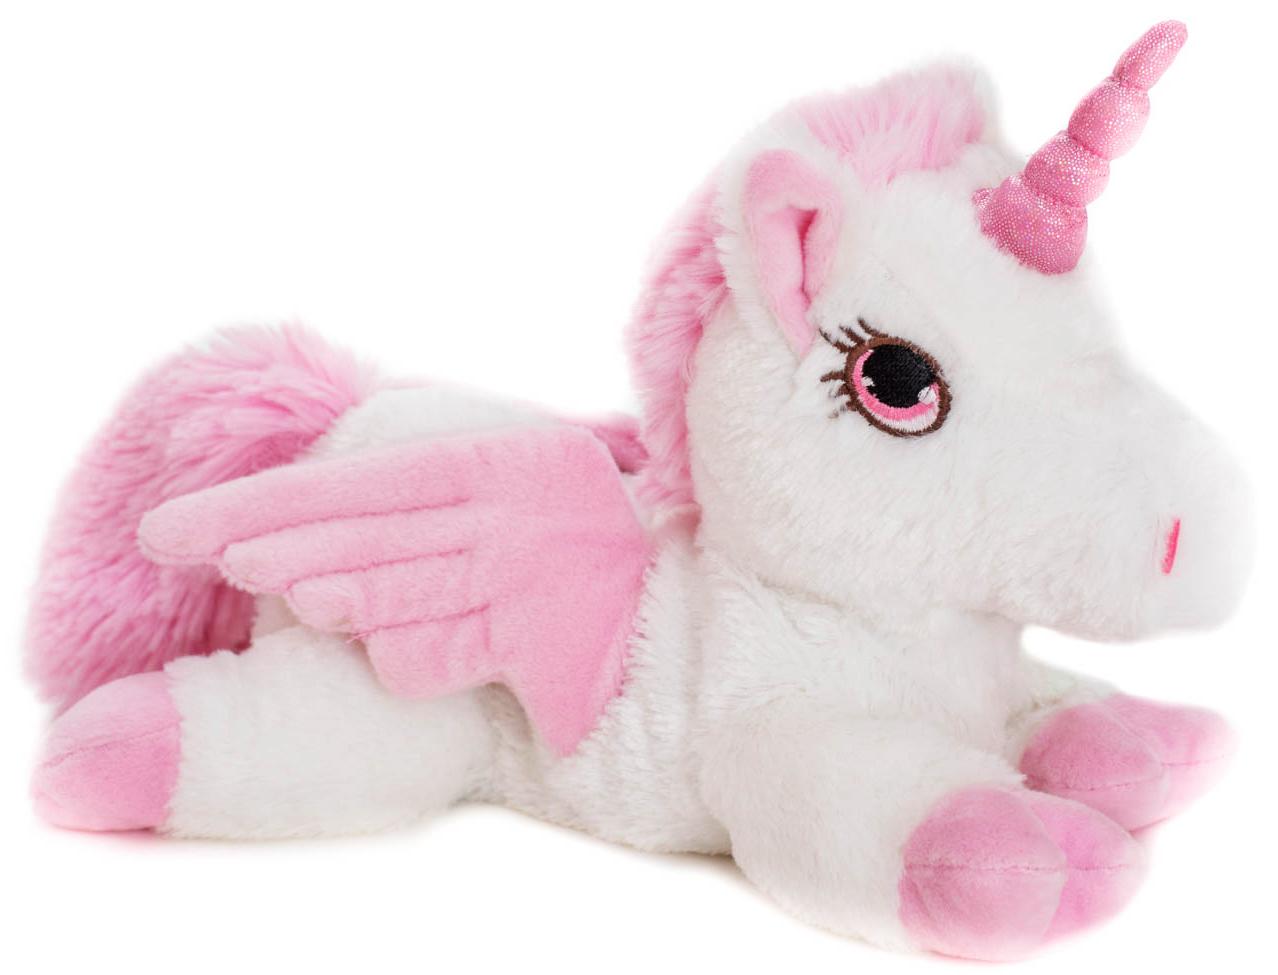 Värmenalle Enhörningen Pegasus - Habibi Plush • Pryloteket